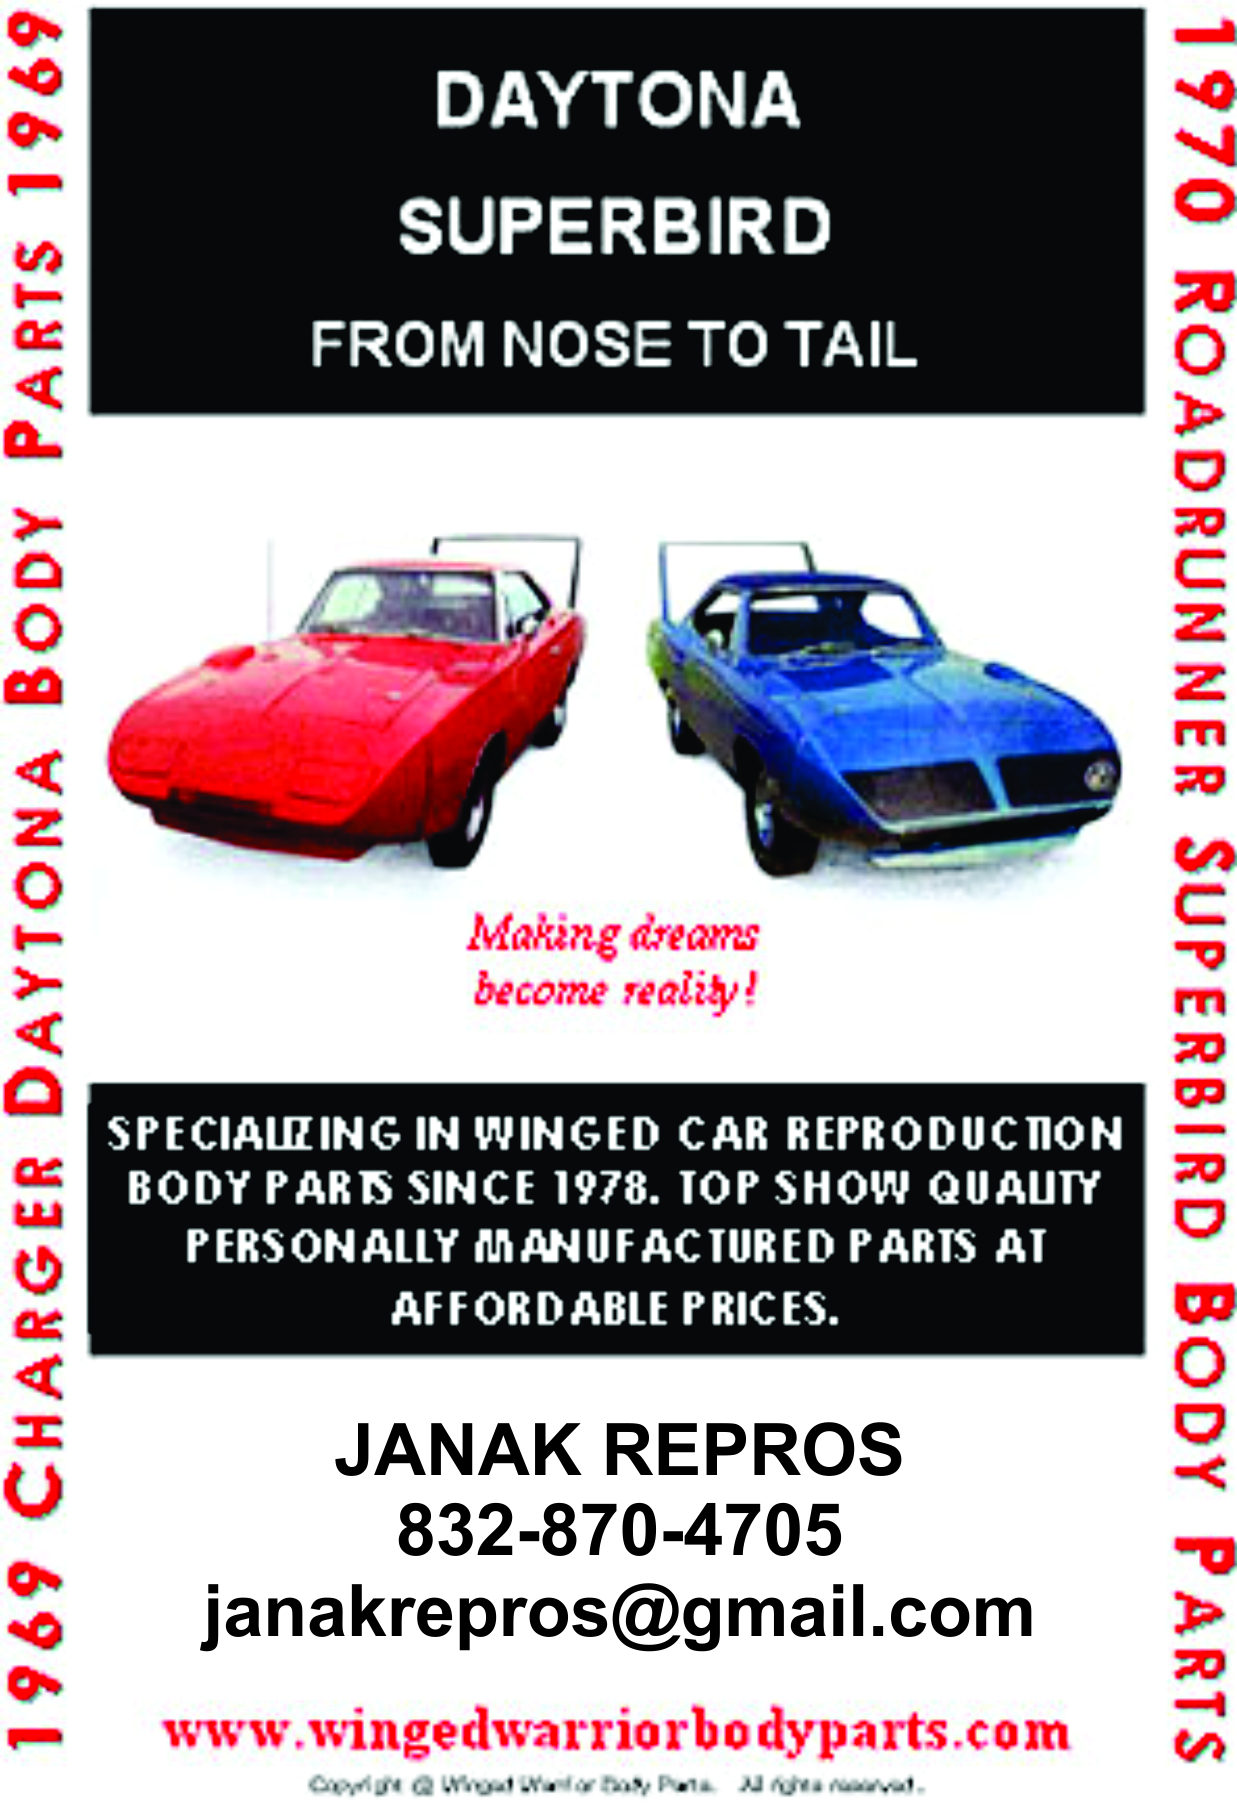 Custom Fabricated Wing Car Conversion Kit - Superbird and